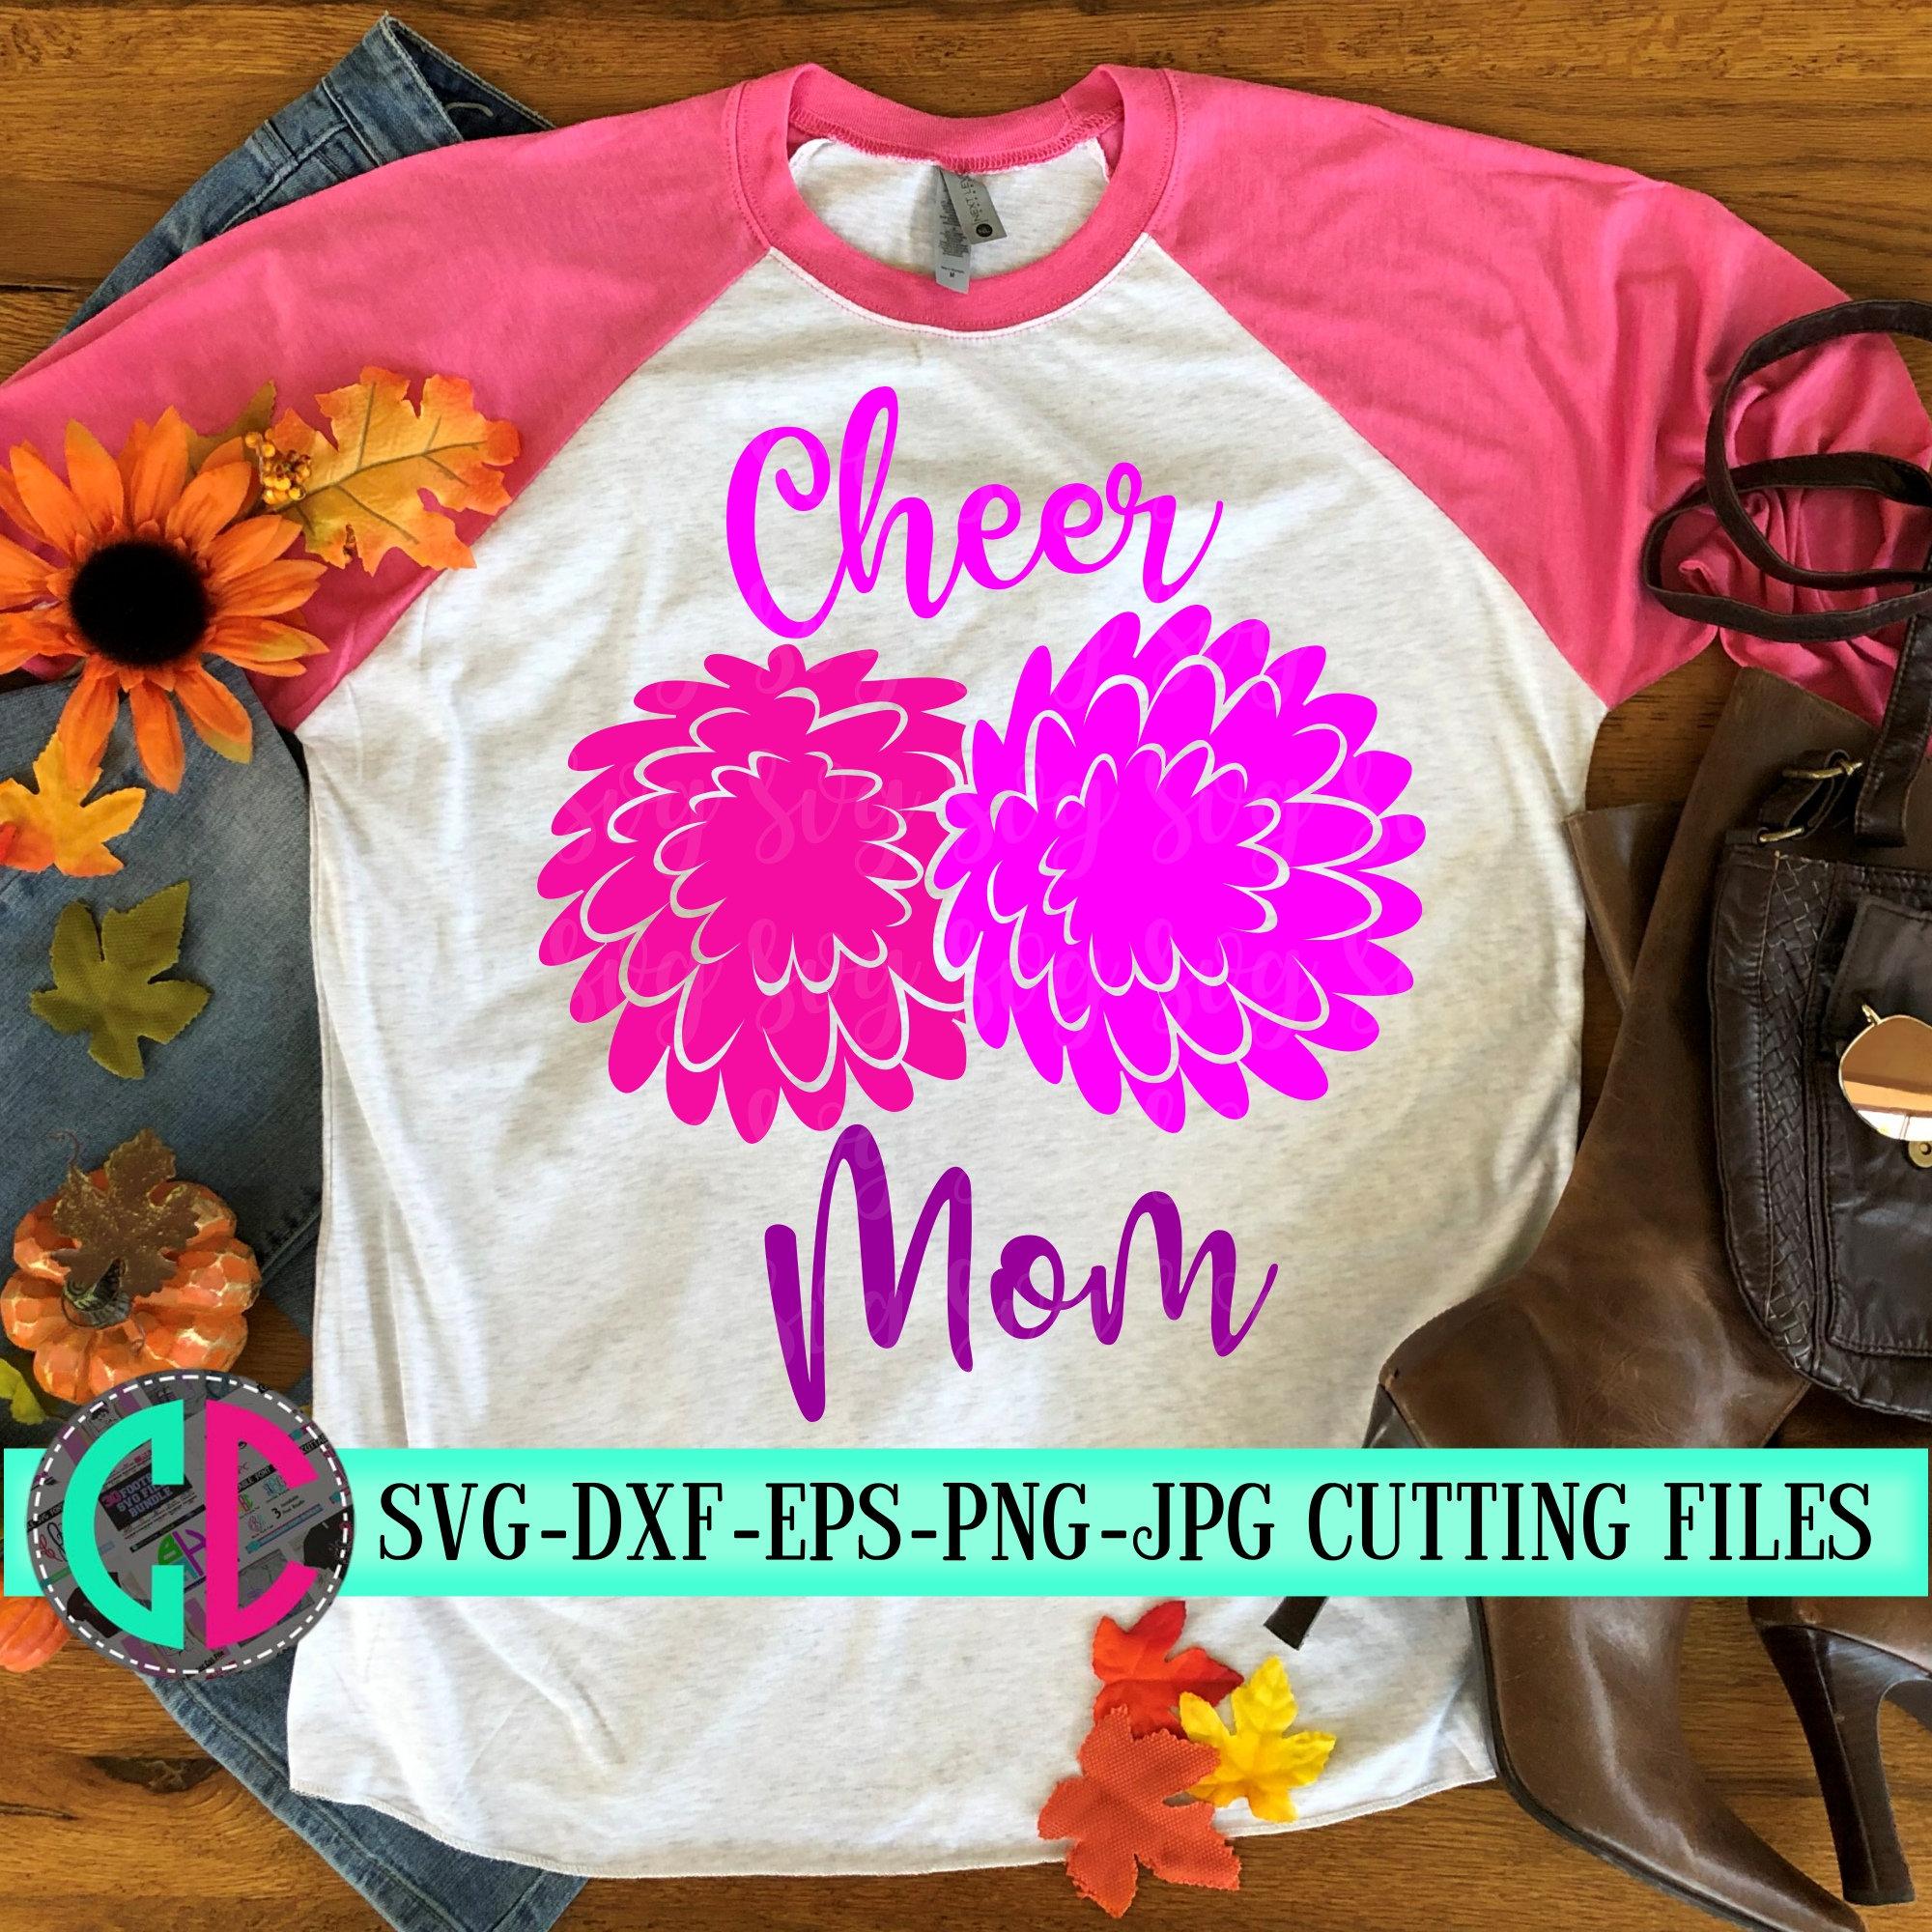 Cheer Mom Pom Pom Svg Cheer Mom Svg Cheerleader Svg Football Svg Cheerleader Cut File Football Mom Svg Svg For Cricut Eps Dxf Svg For Cricut